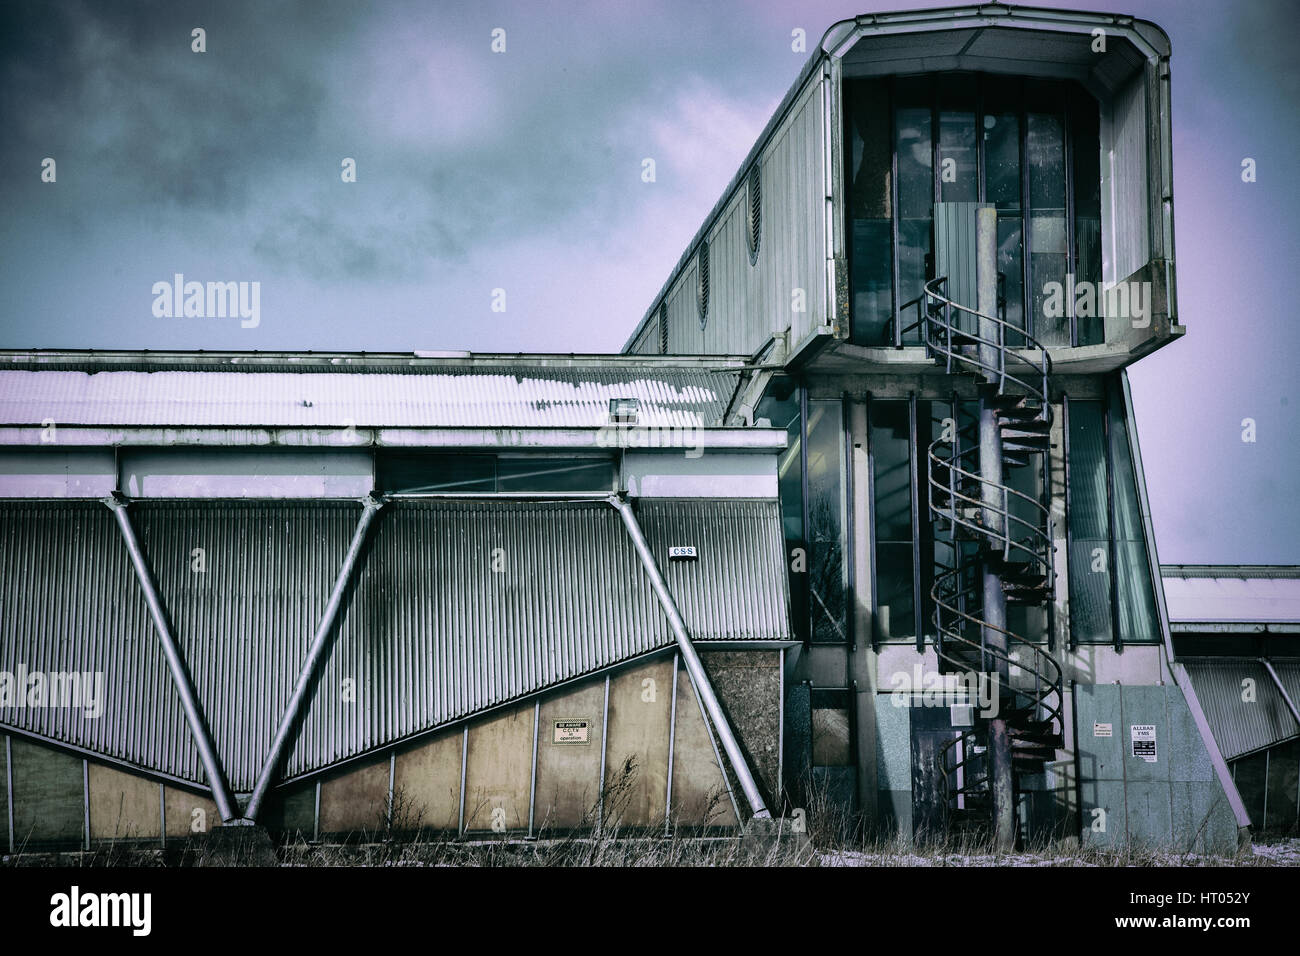 Derelict Industrial unit near Shotts, North Lanarkshire - Stock Image